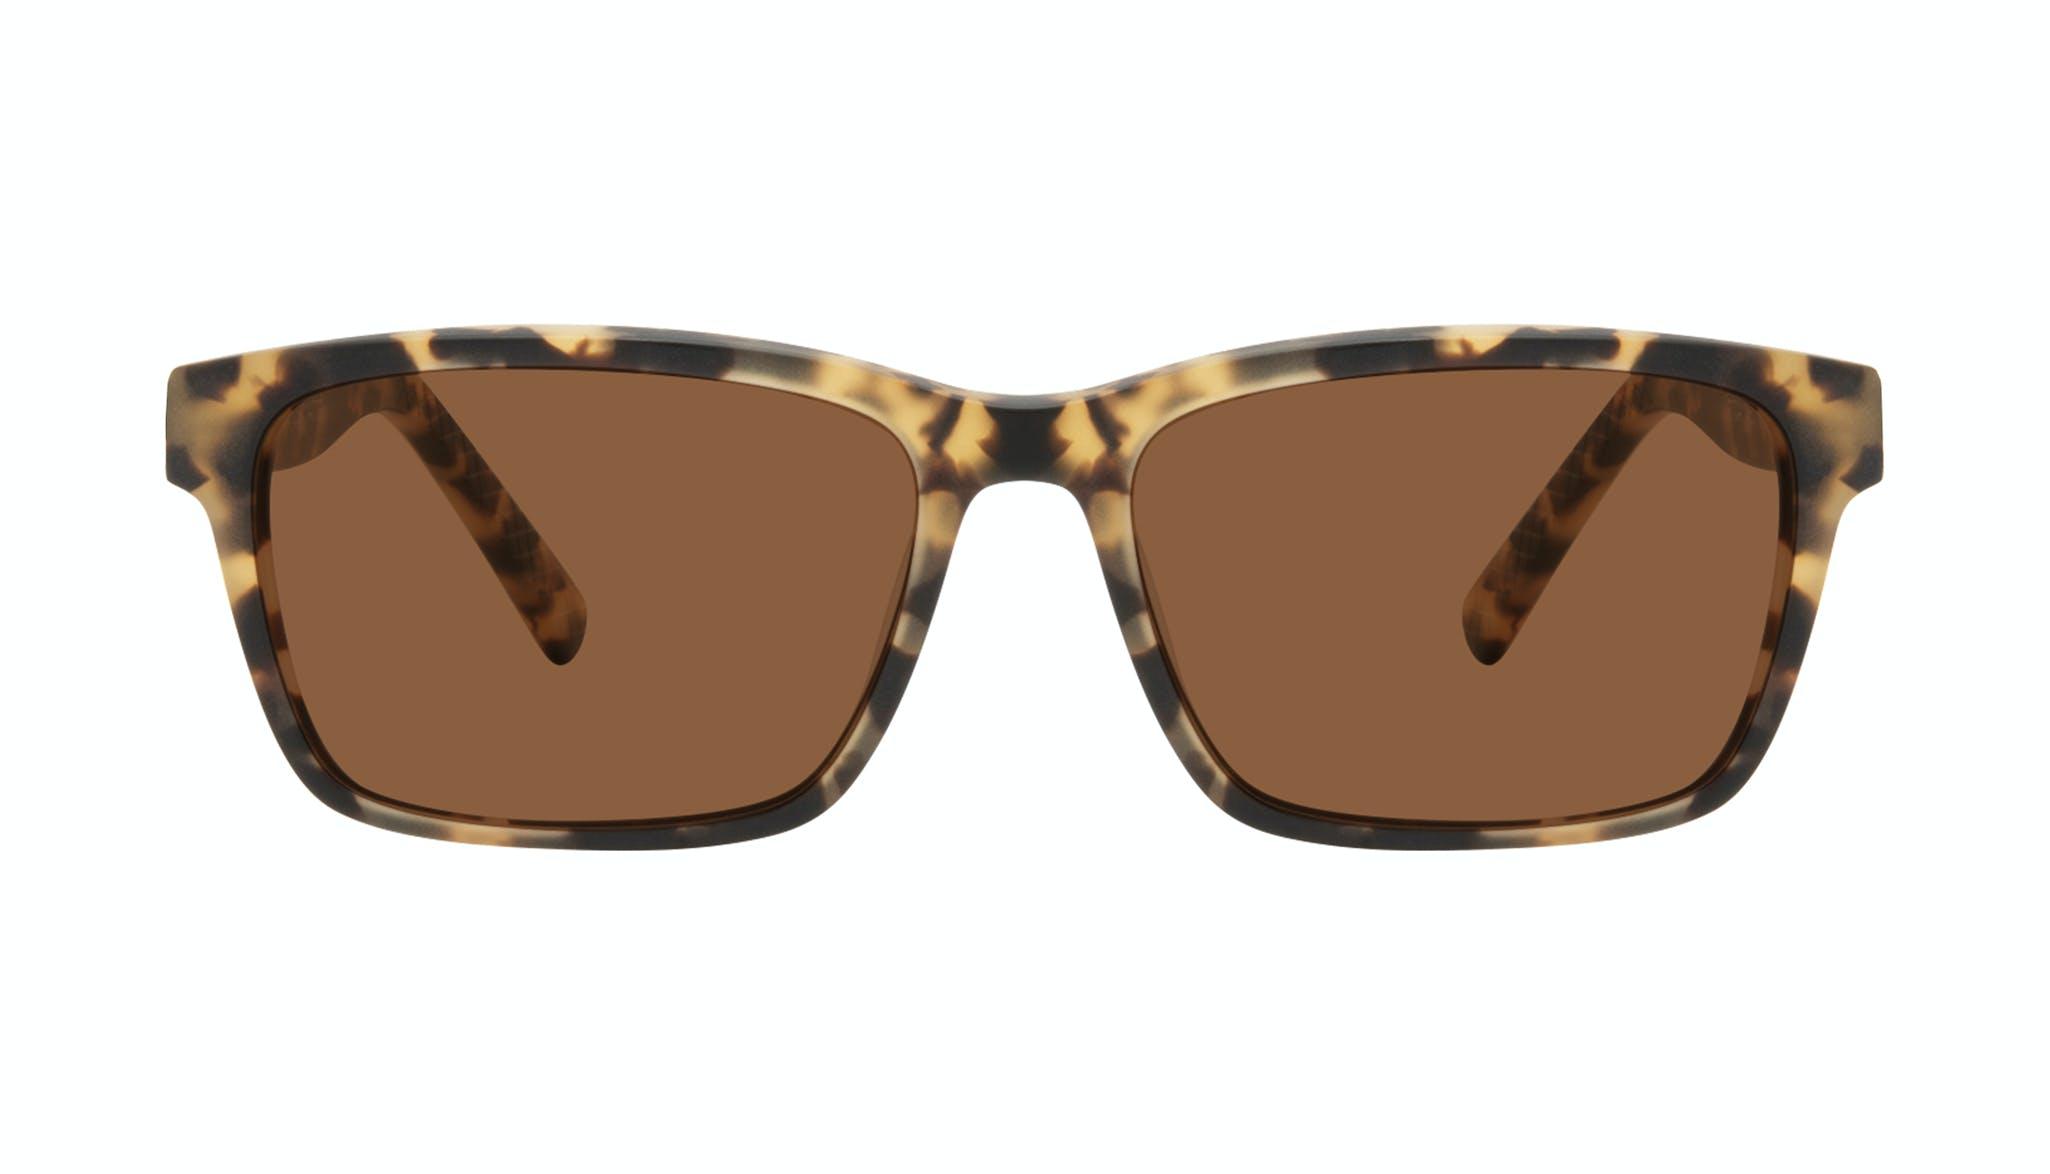 Affordable Fashion Glasses Square Sunglasses Men Chief Tortoise Matte Front